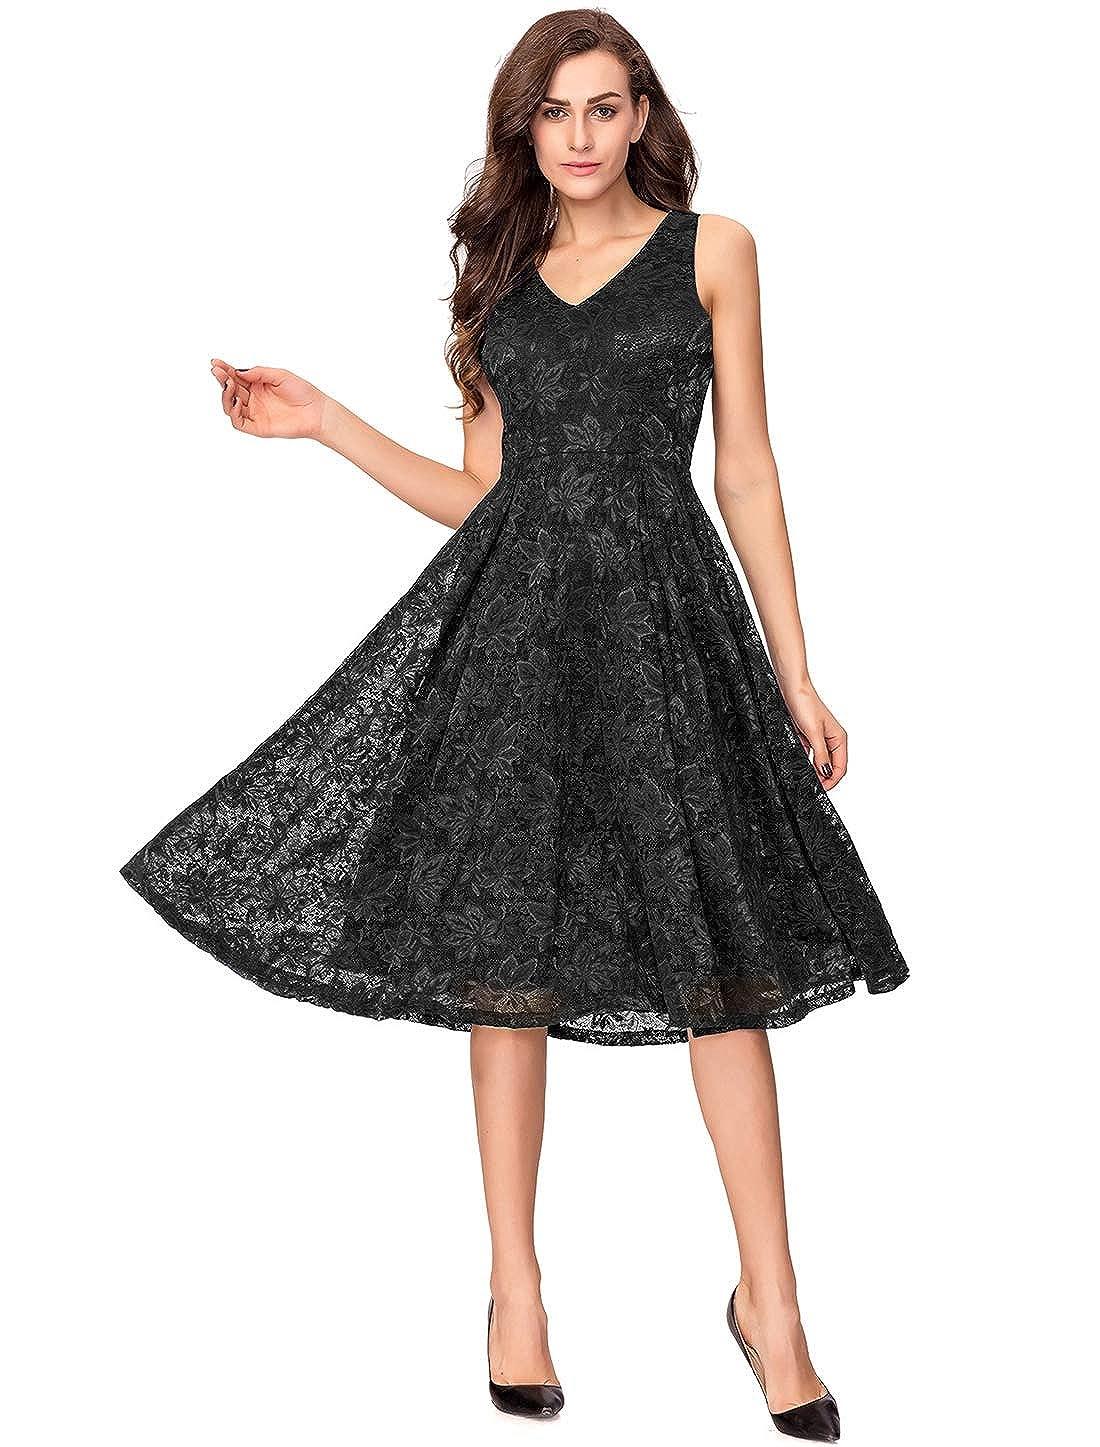 0faac38db7912 Amazon.com: Noctflos Lace V Neck Fit & Flare Midi Cocktail Dress for ...